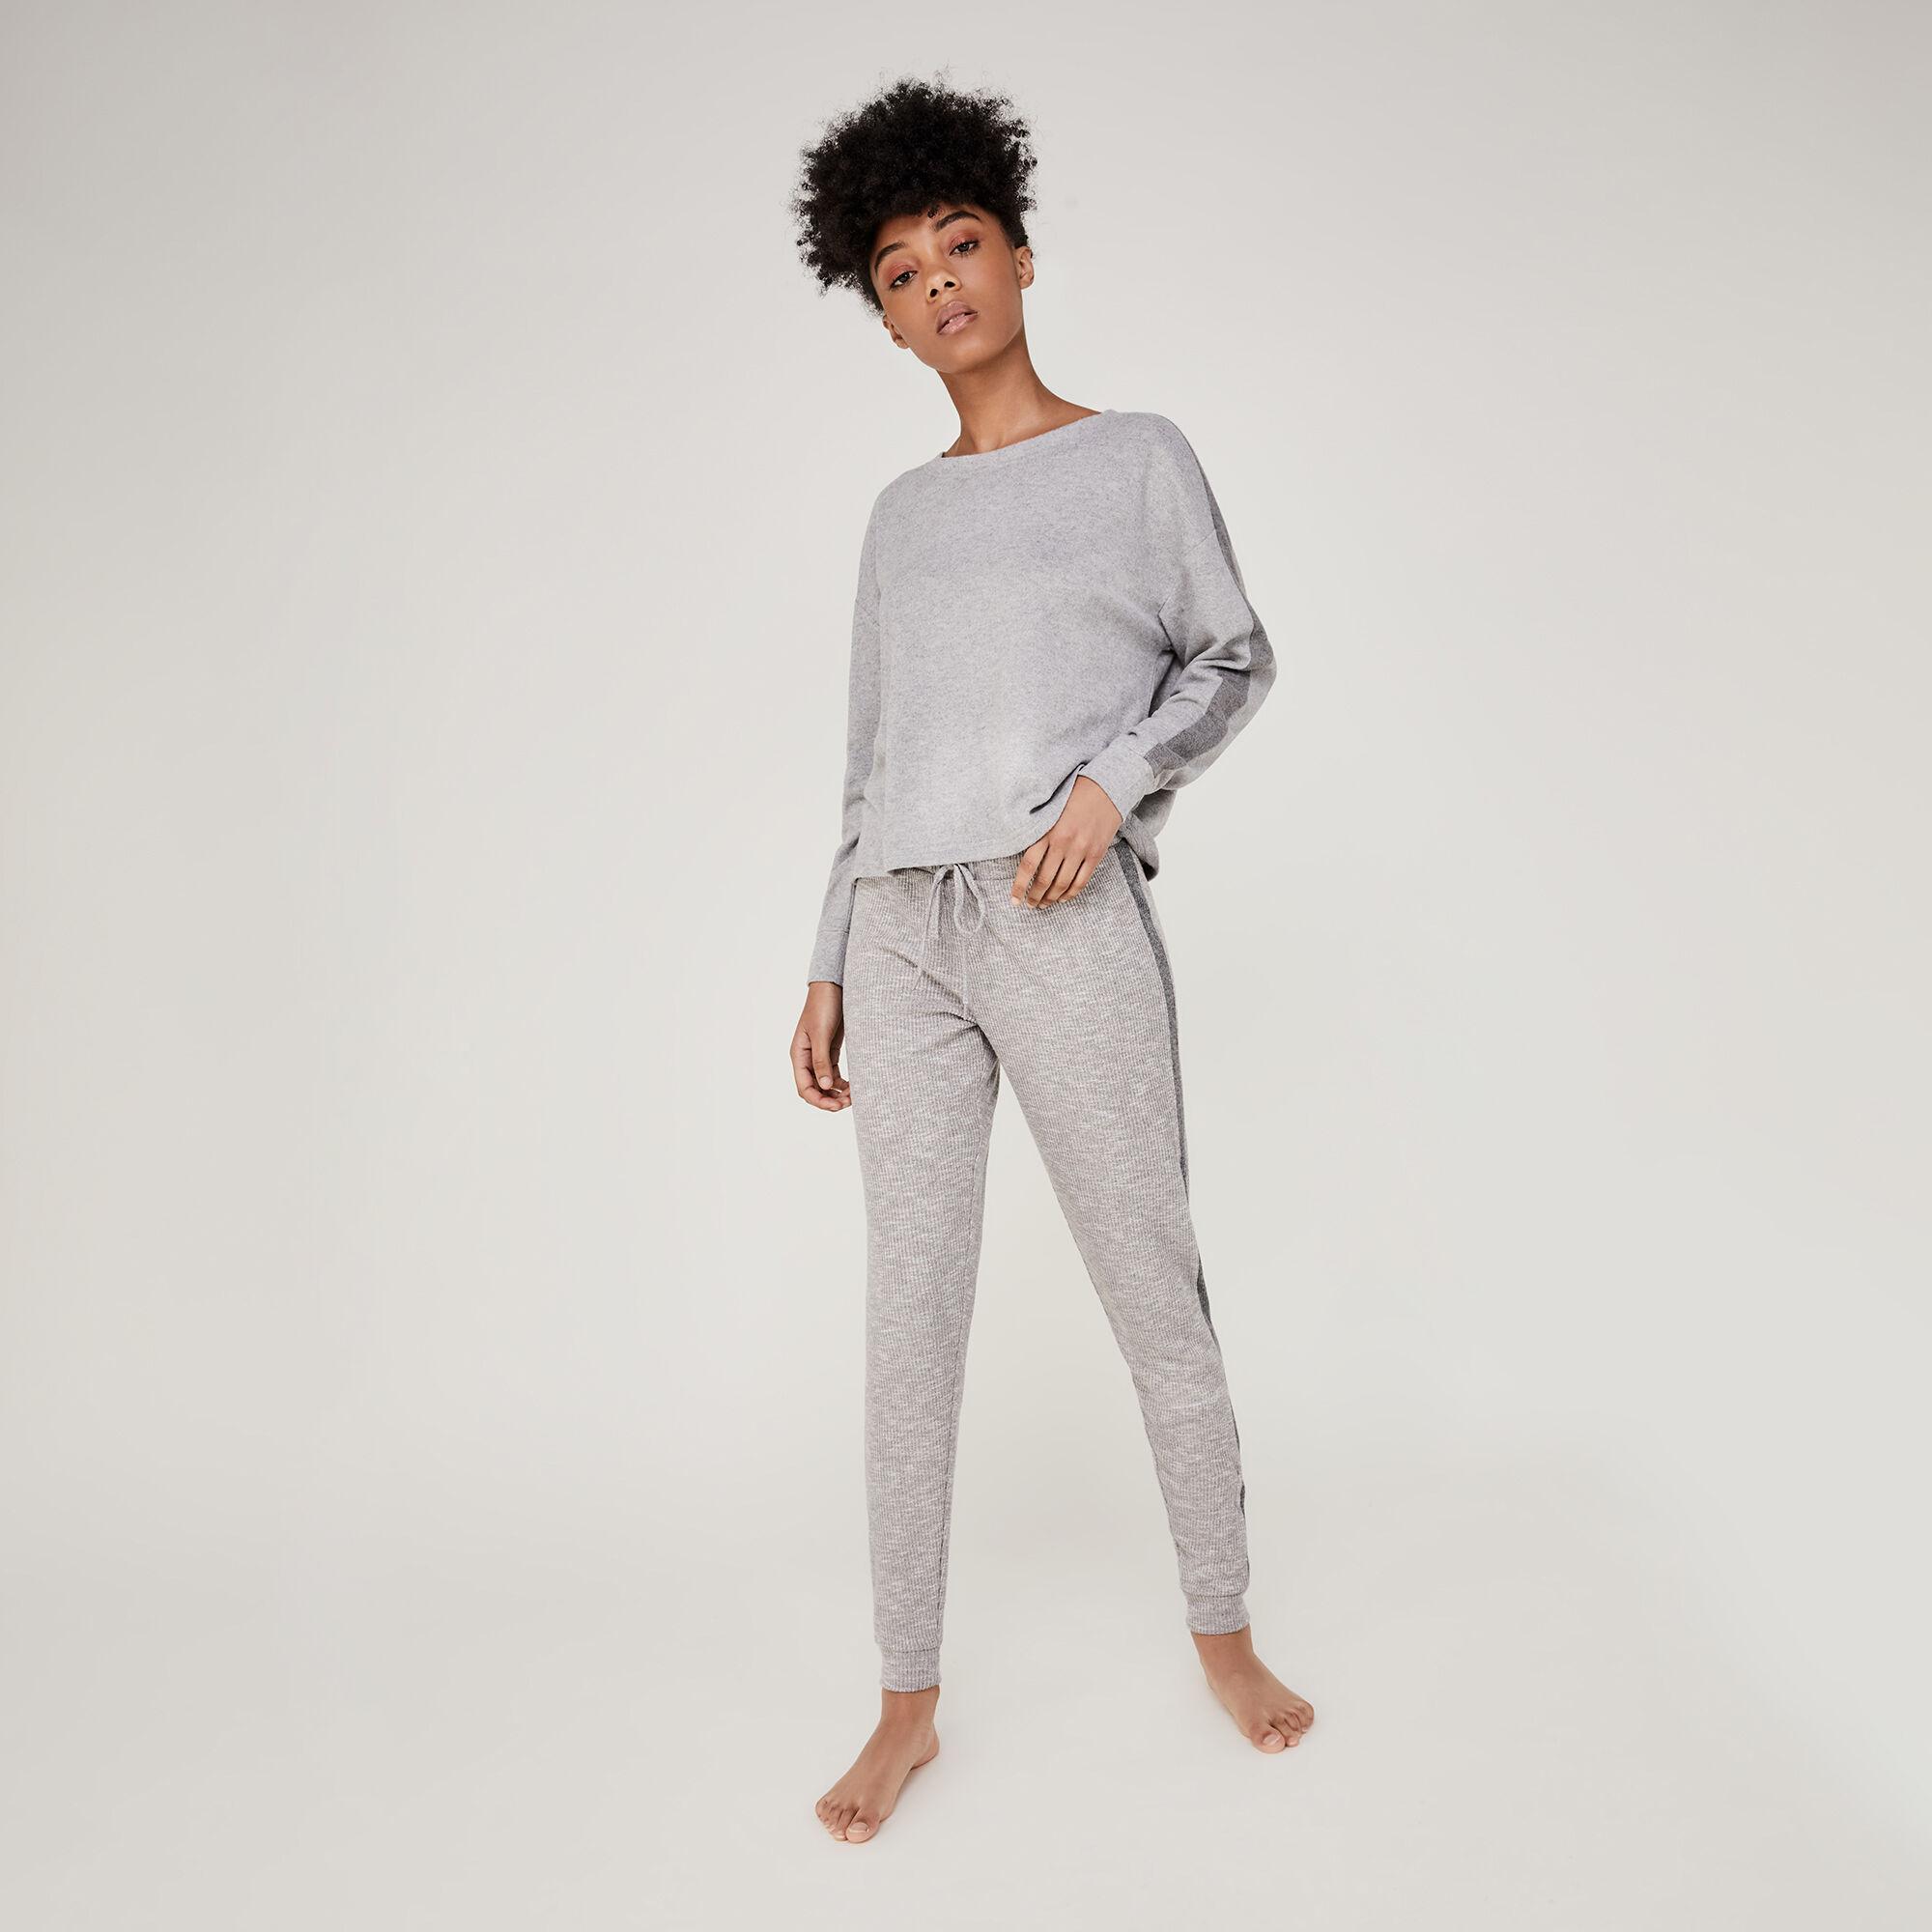 Et Pyjama Undiz Et Et Undiz Combinaison Undiz Pyjama Pyjama Combinaison Combinaison qTxtaa